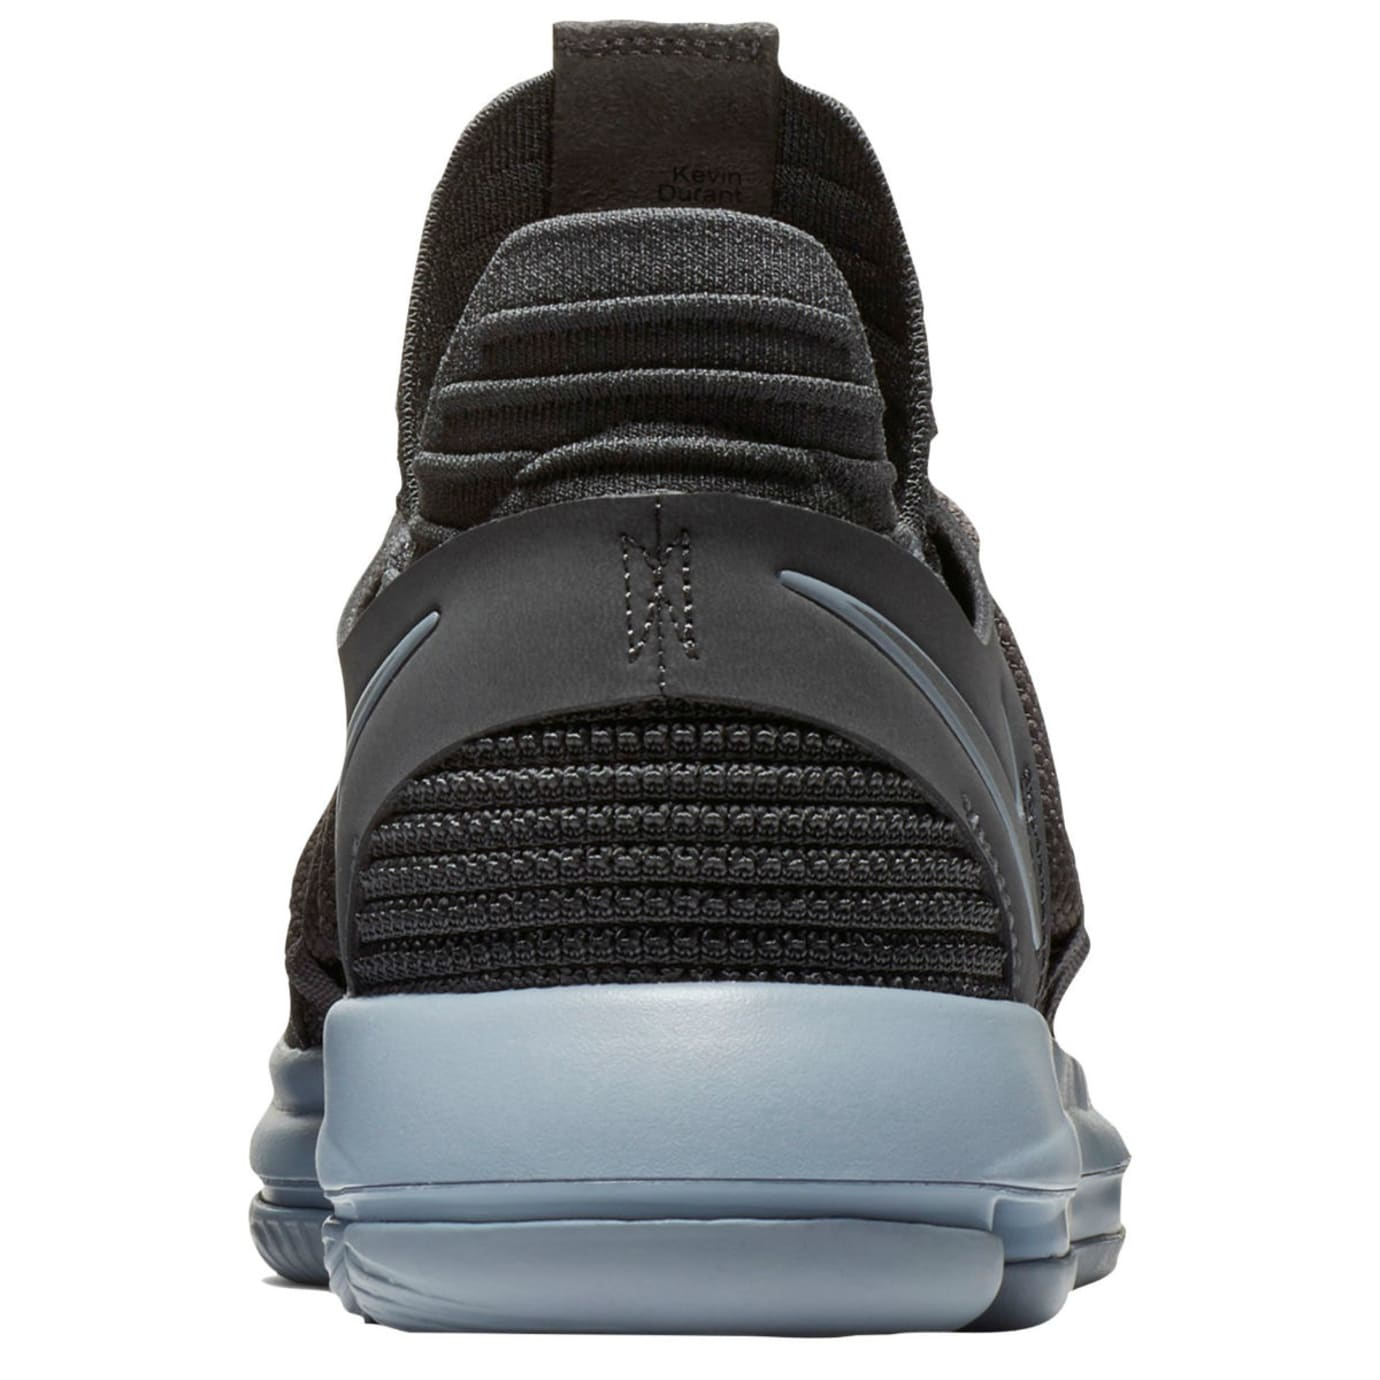 Nike KD 10 Dark Grey Release Date Heel 897815-005